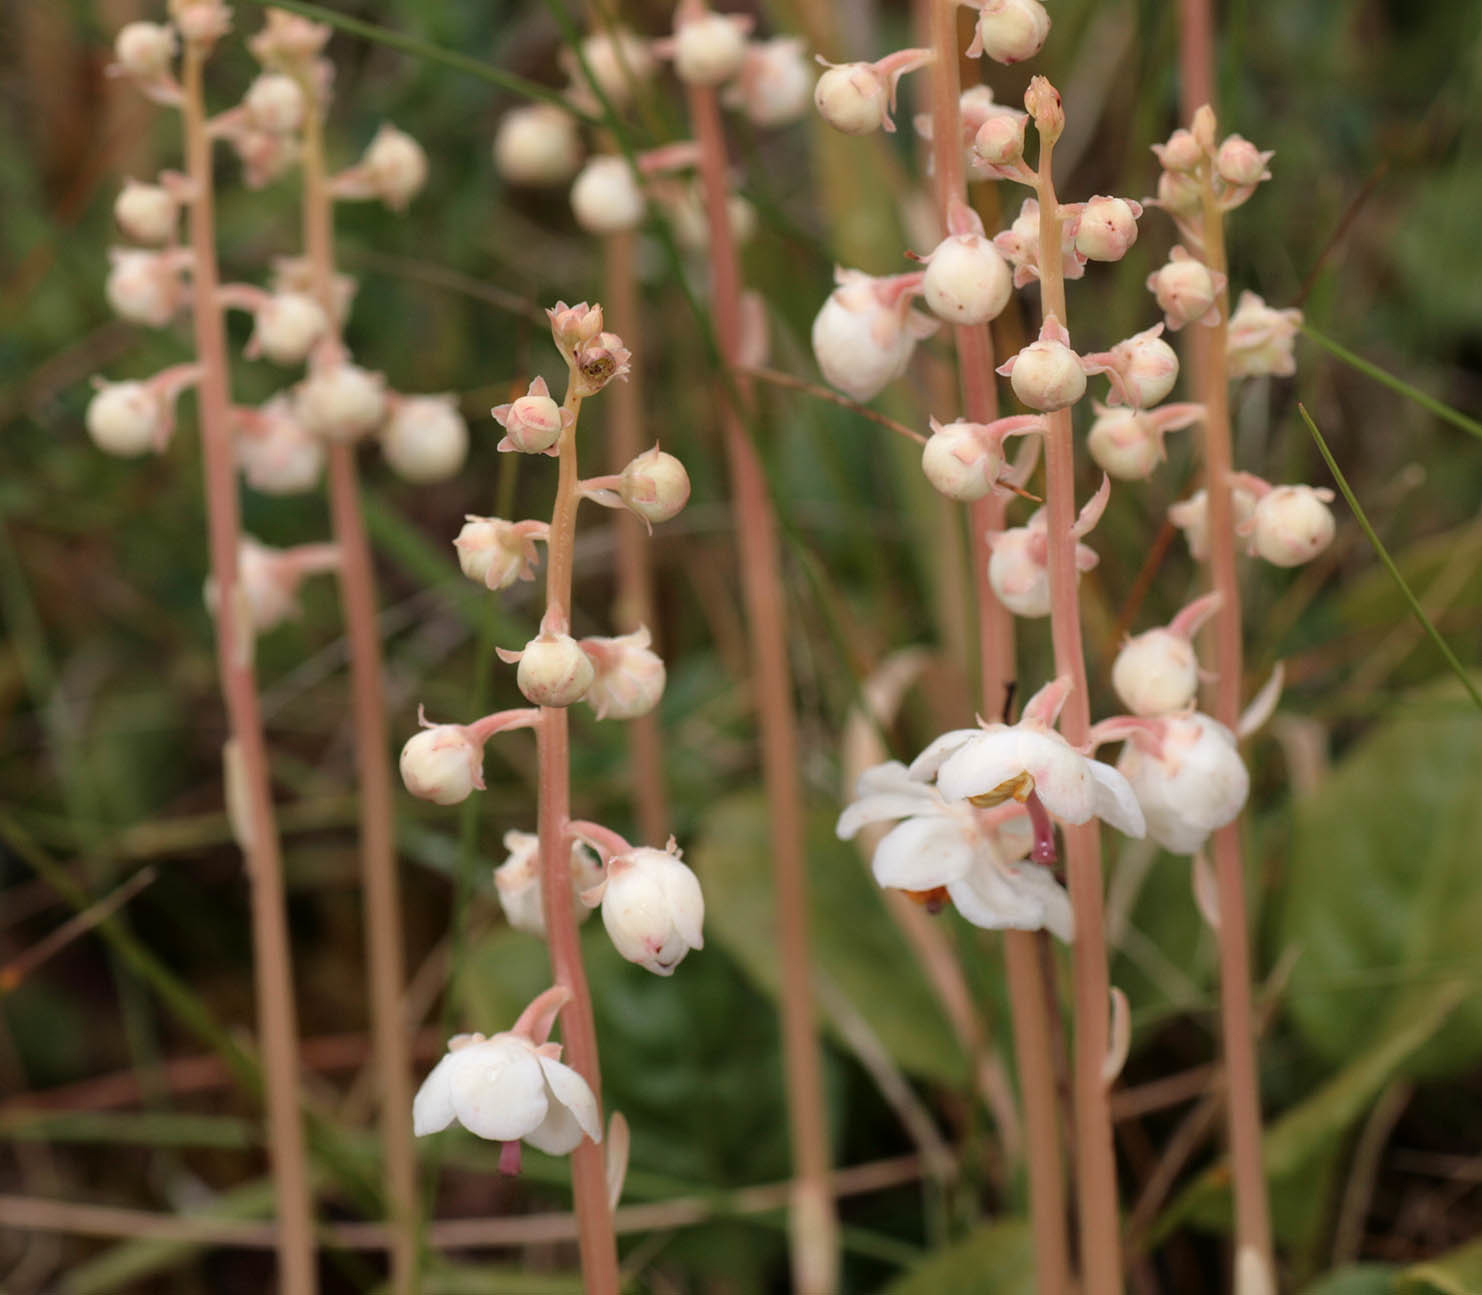 Flower-buds-of-Round-leaved-wintergreen